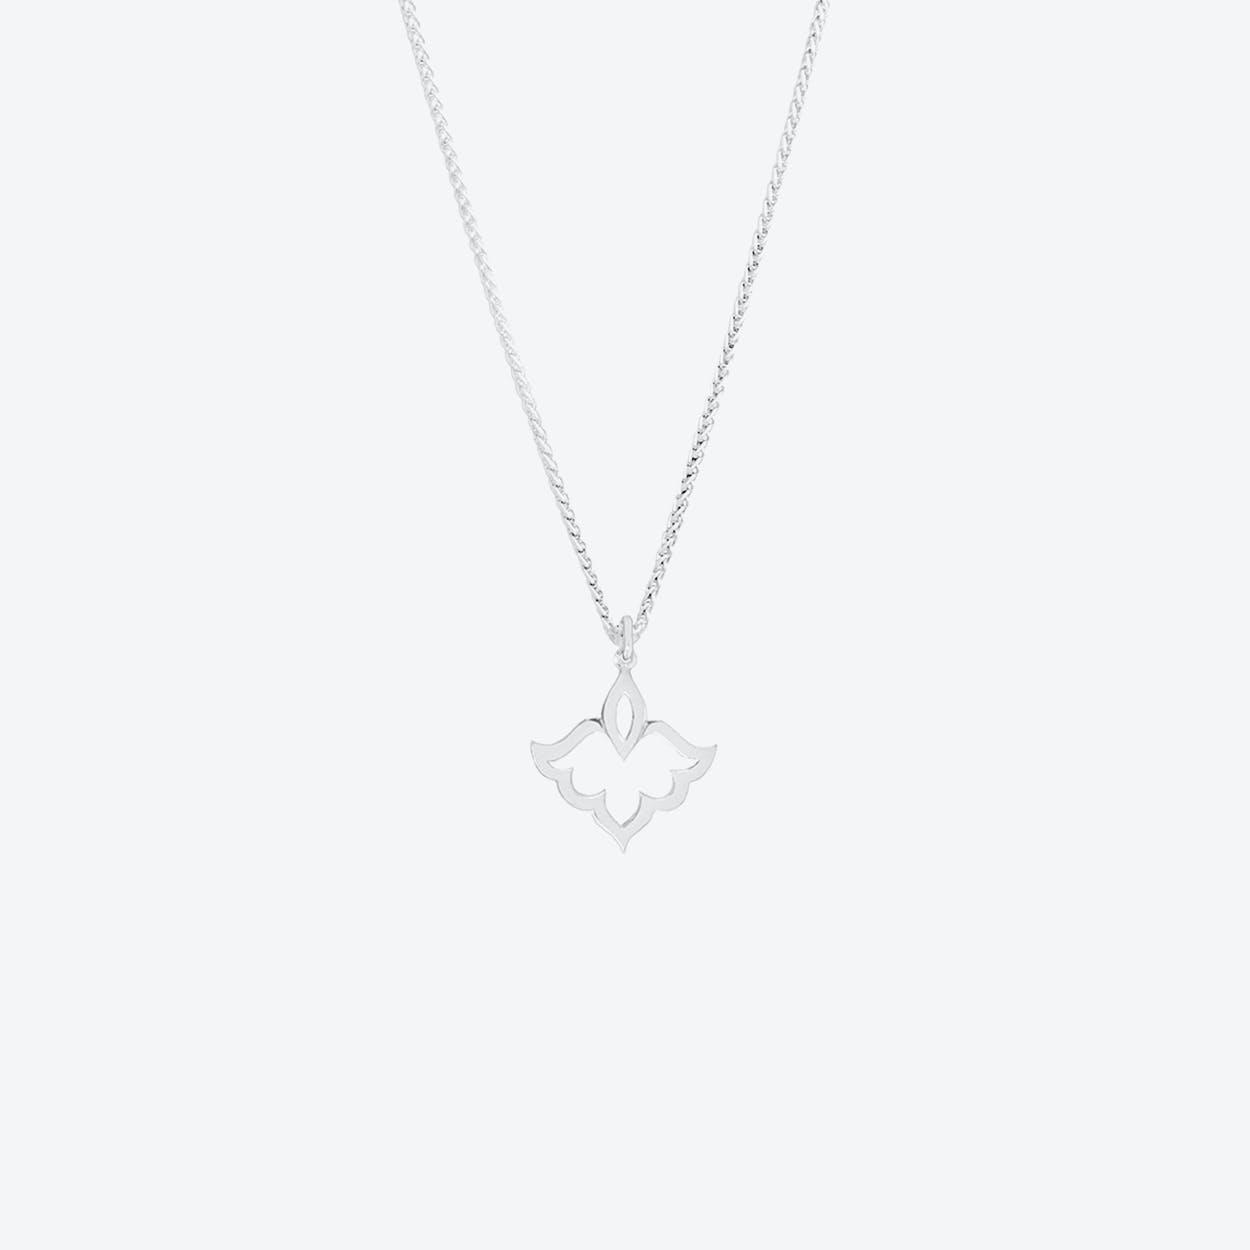 Tiny Lotus Pendant Necklace